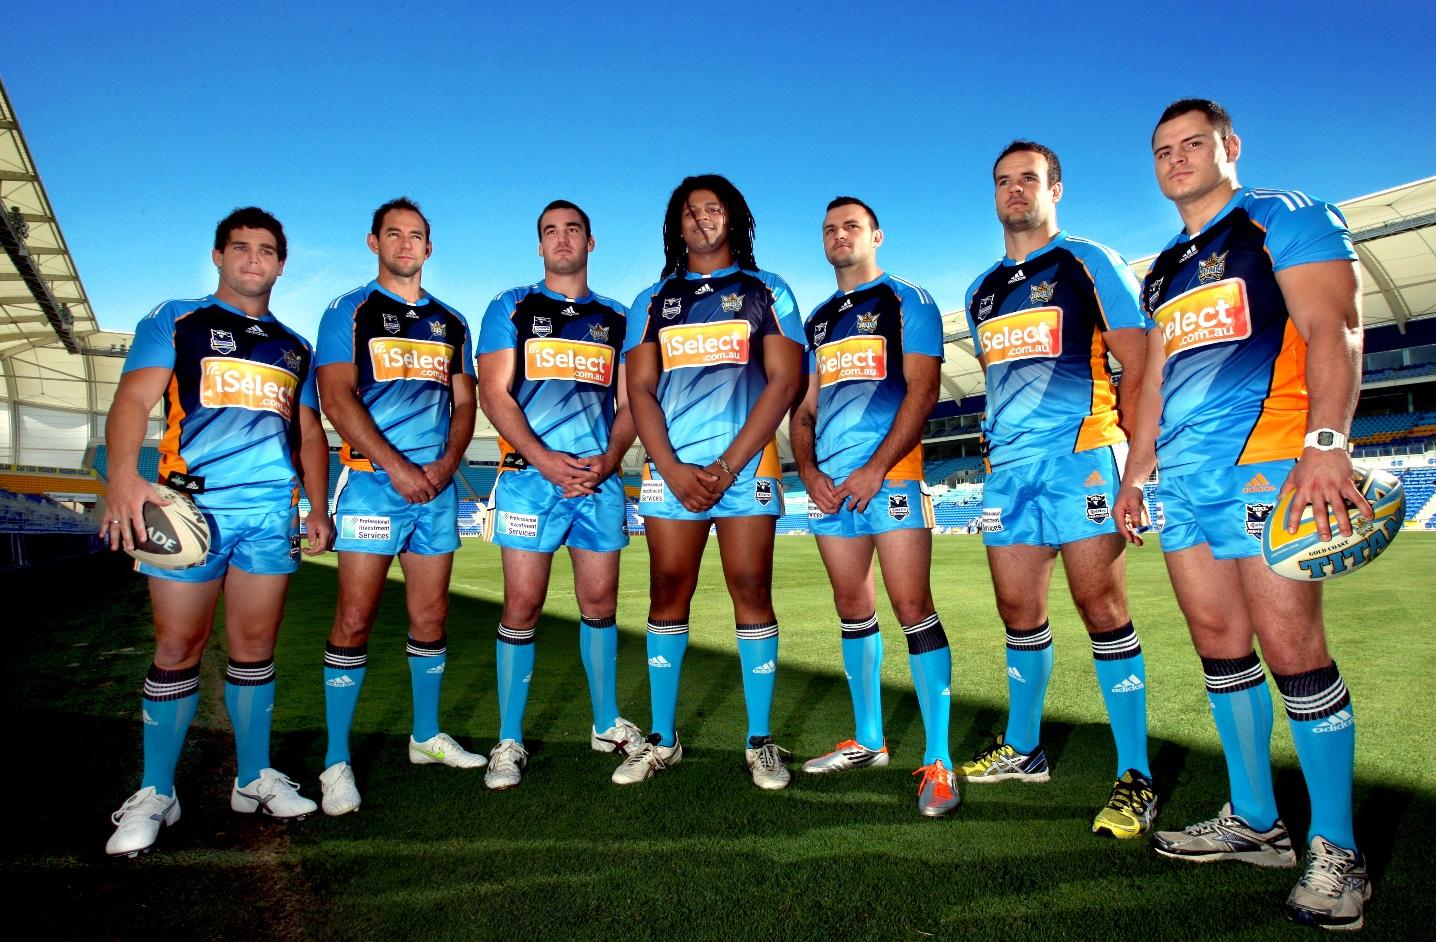 New Gold Coast Titans players